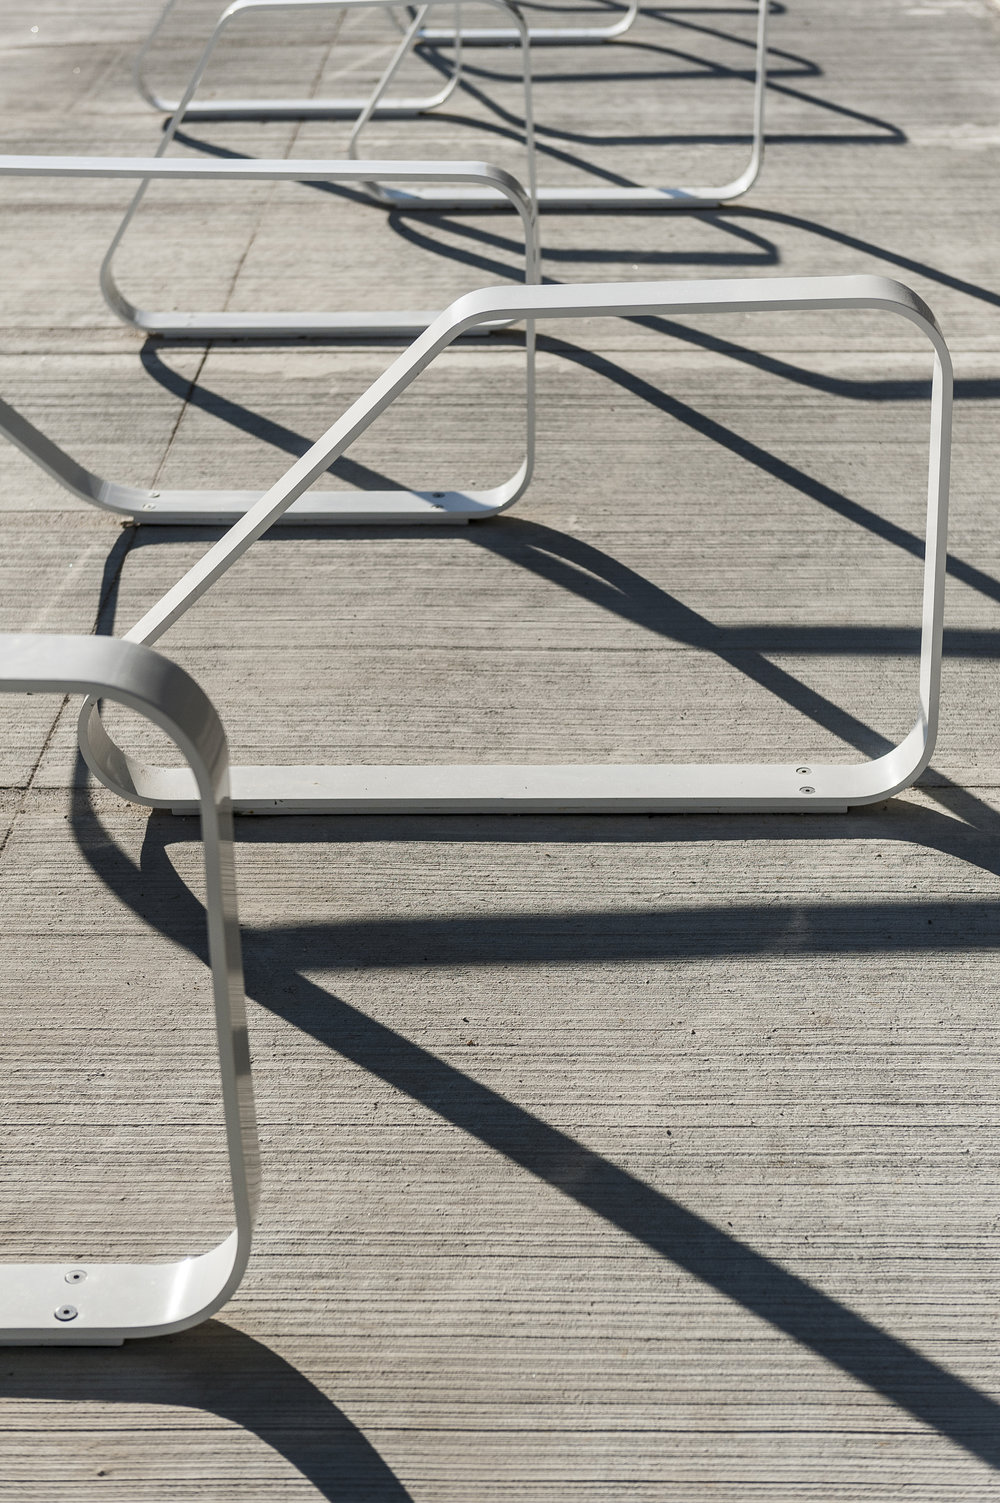 cityoflakes_bike_racks_detail.jpg